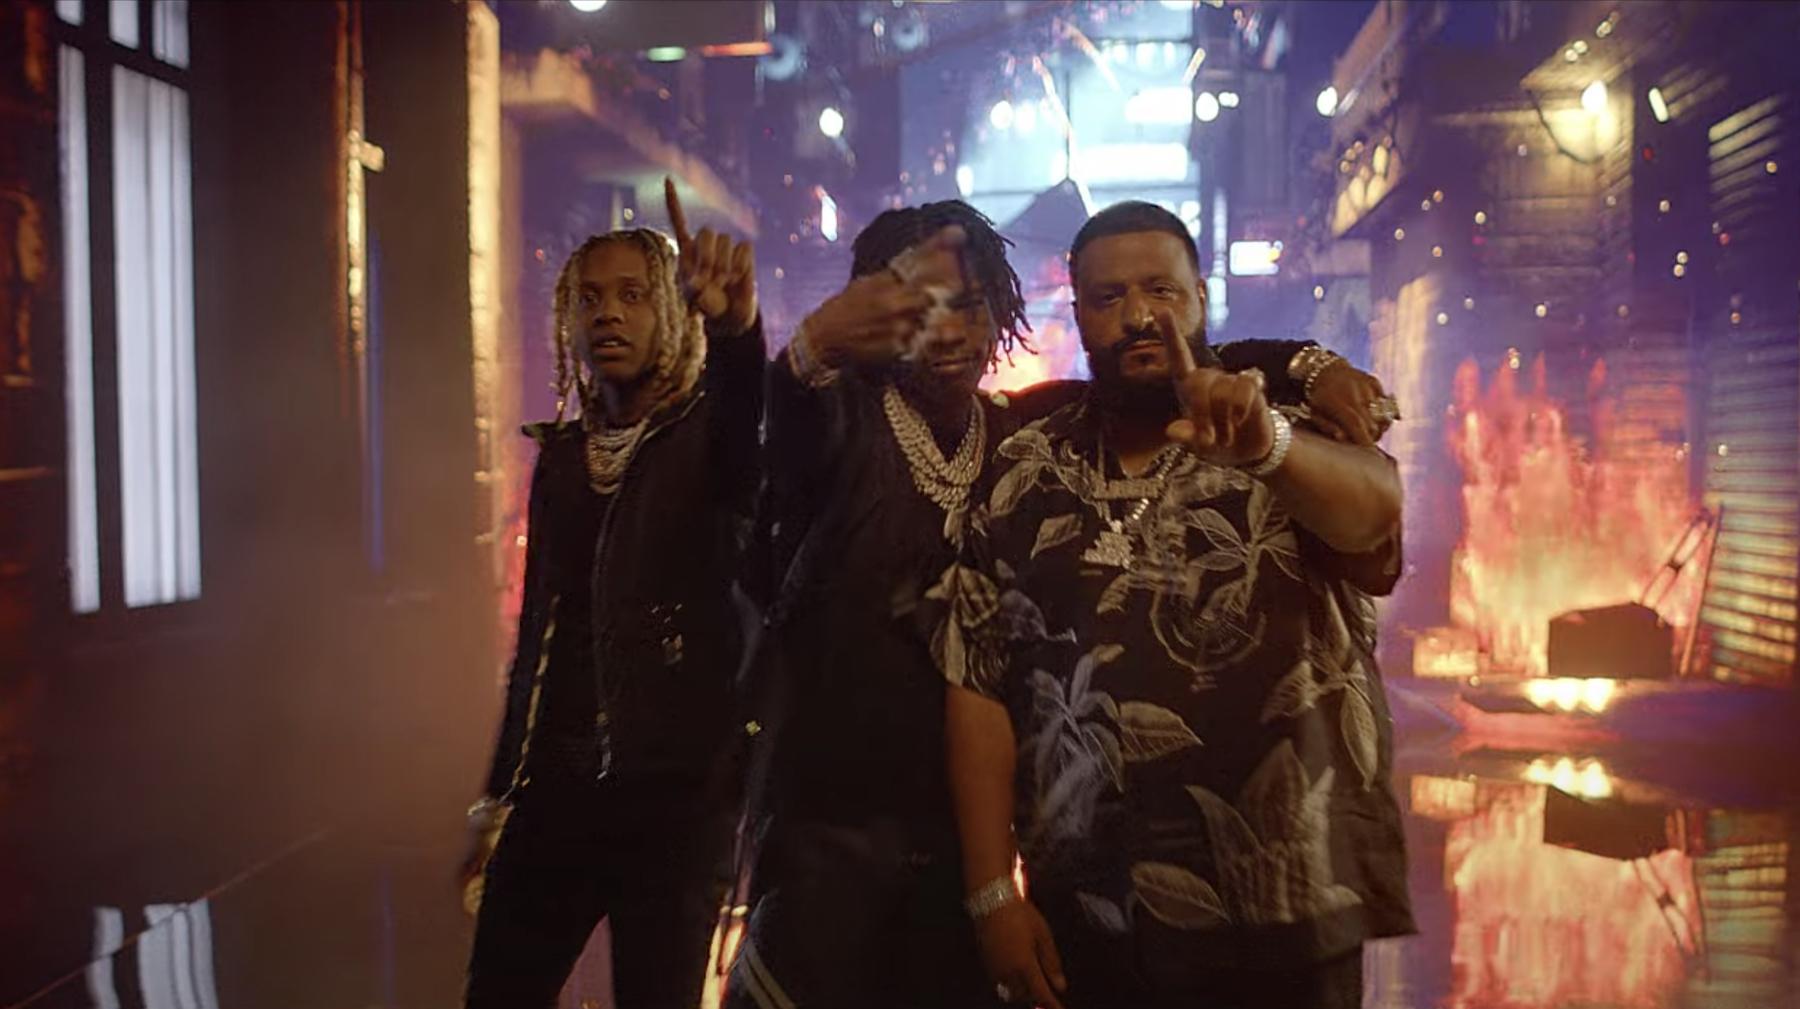 Lil Durk, Lil Baby, and DJ Khaled